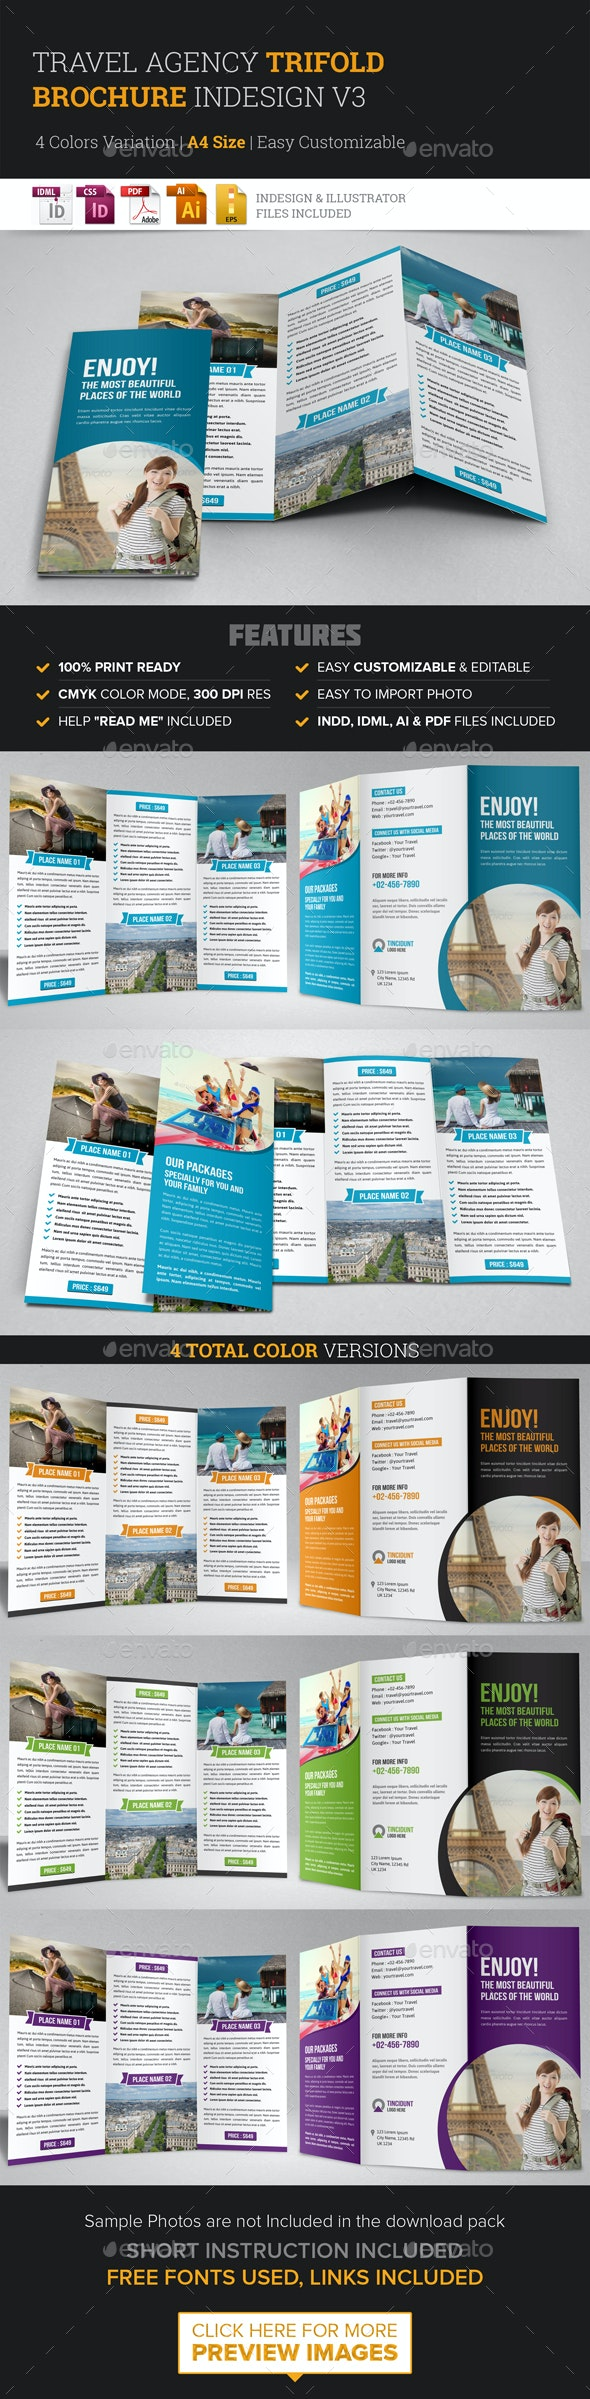 Travel Trifold Brochure InDesign Template v3 - Corporate Brochures